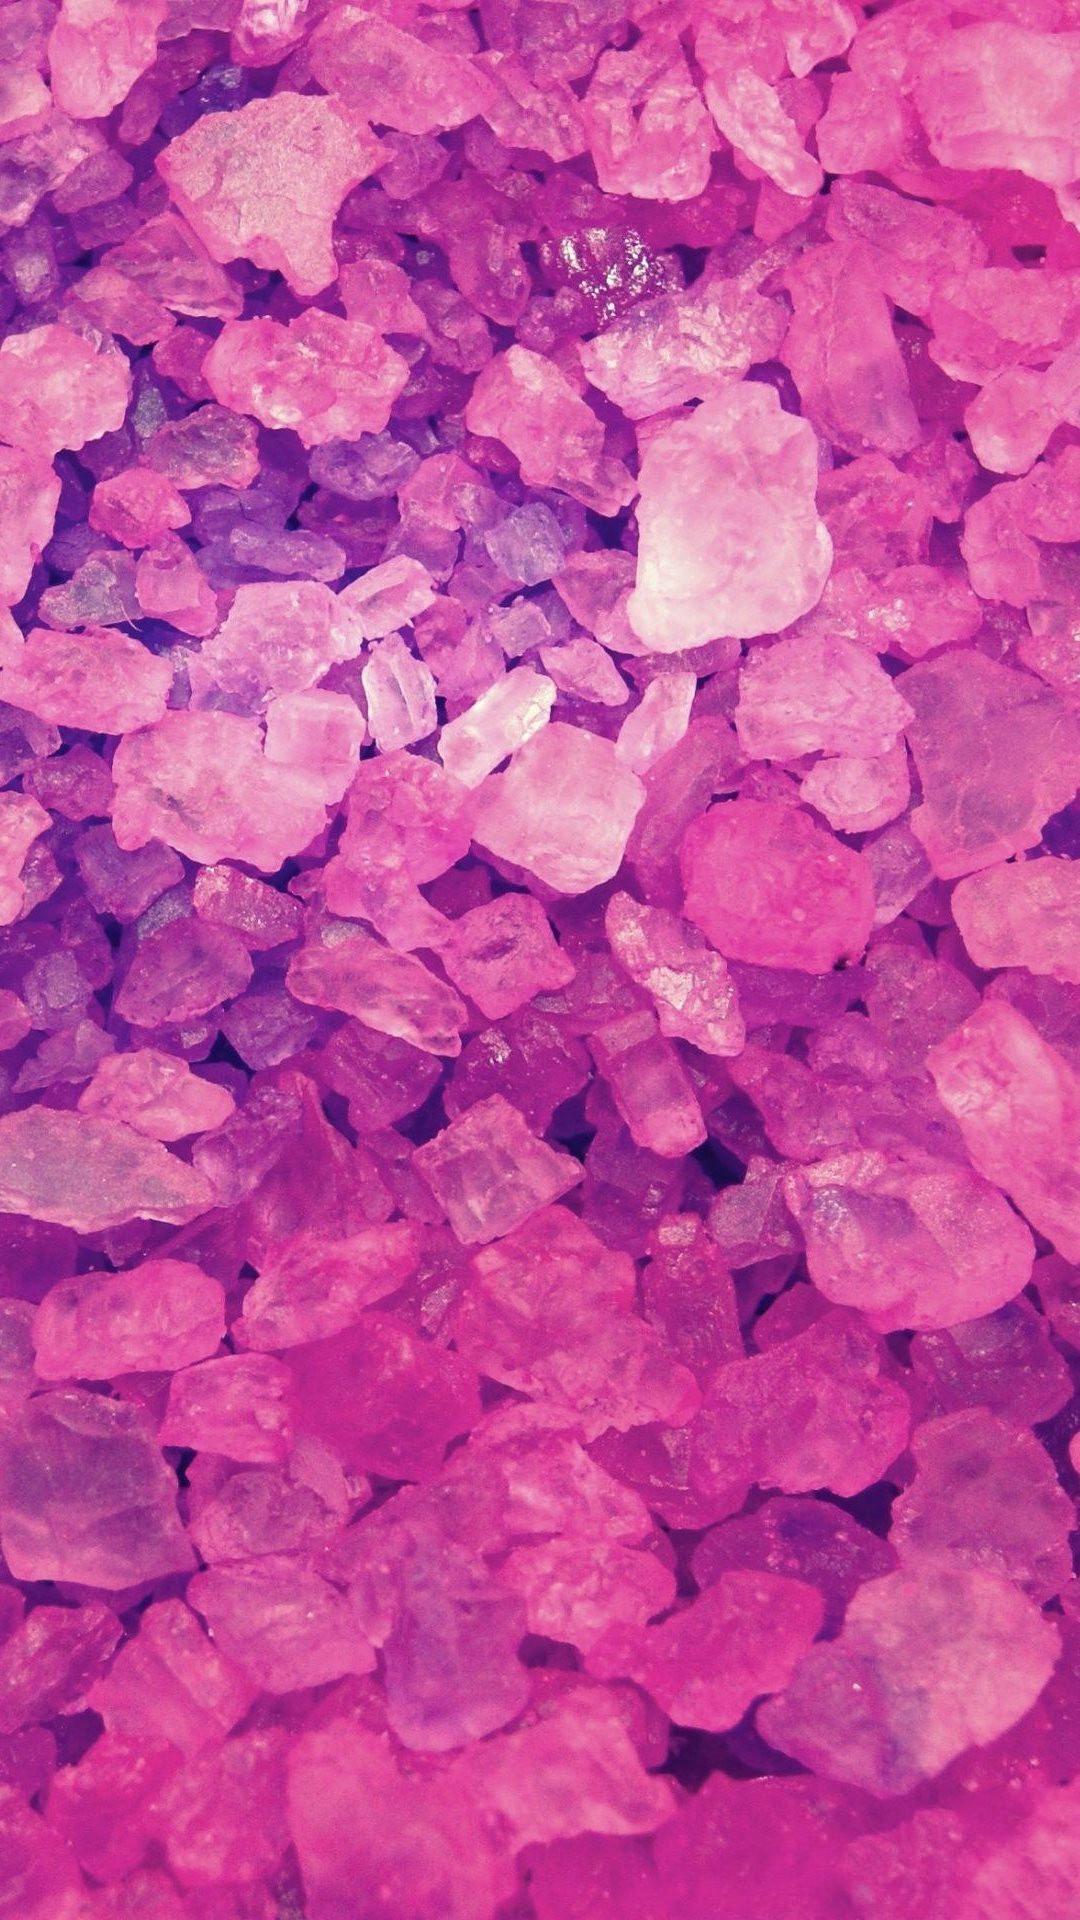 Pink Crystals Lockscreen iPhone 6 Plus HD Wallpaper